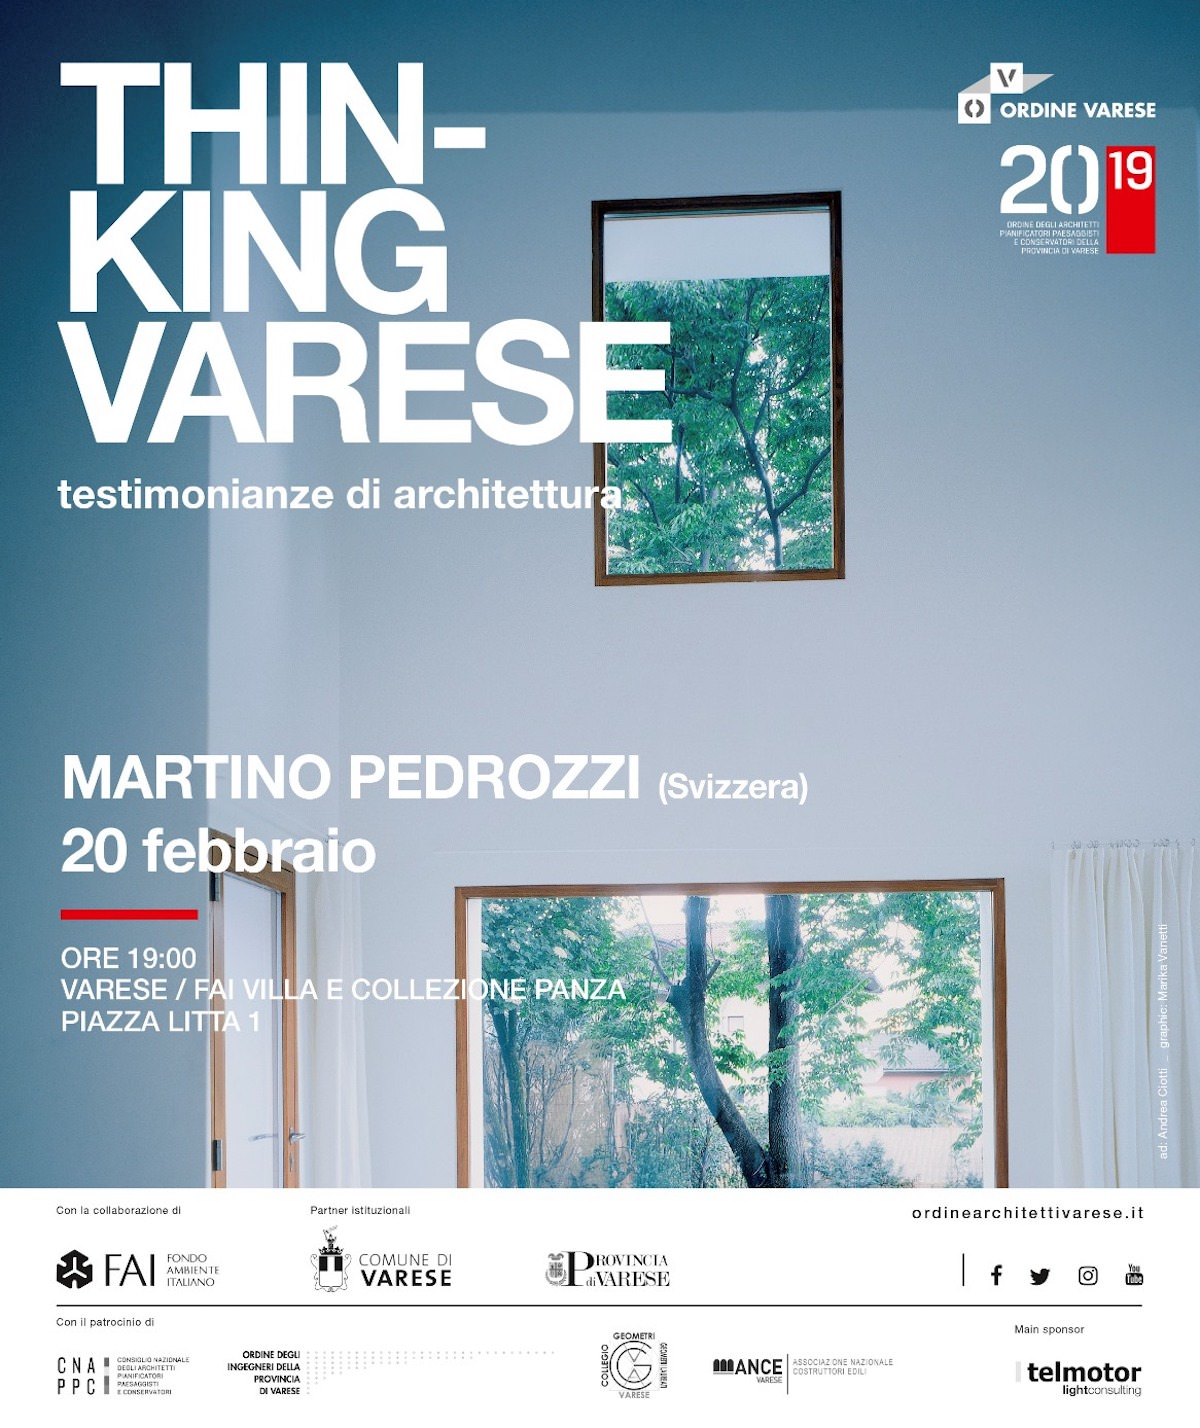 Martino Pedrozzi Varese